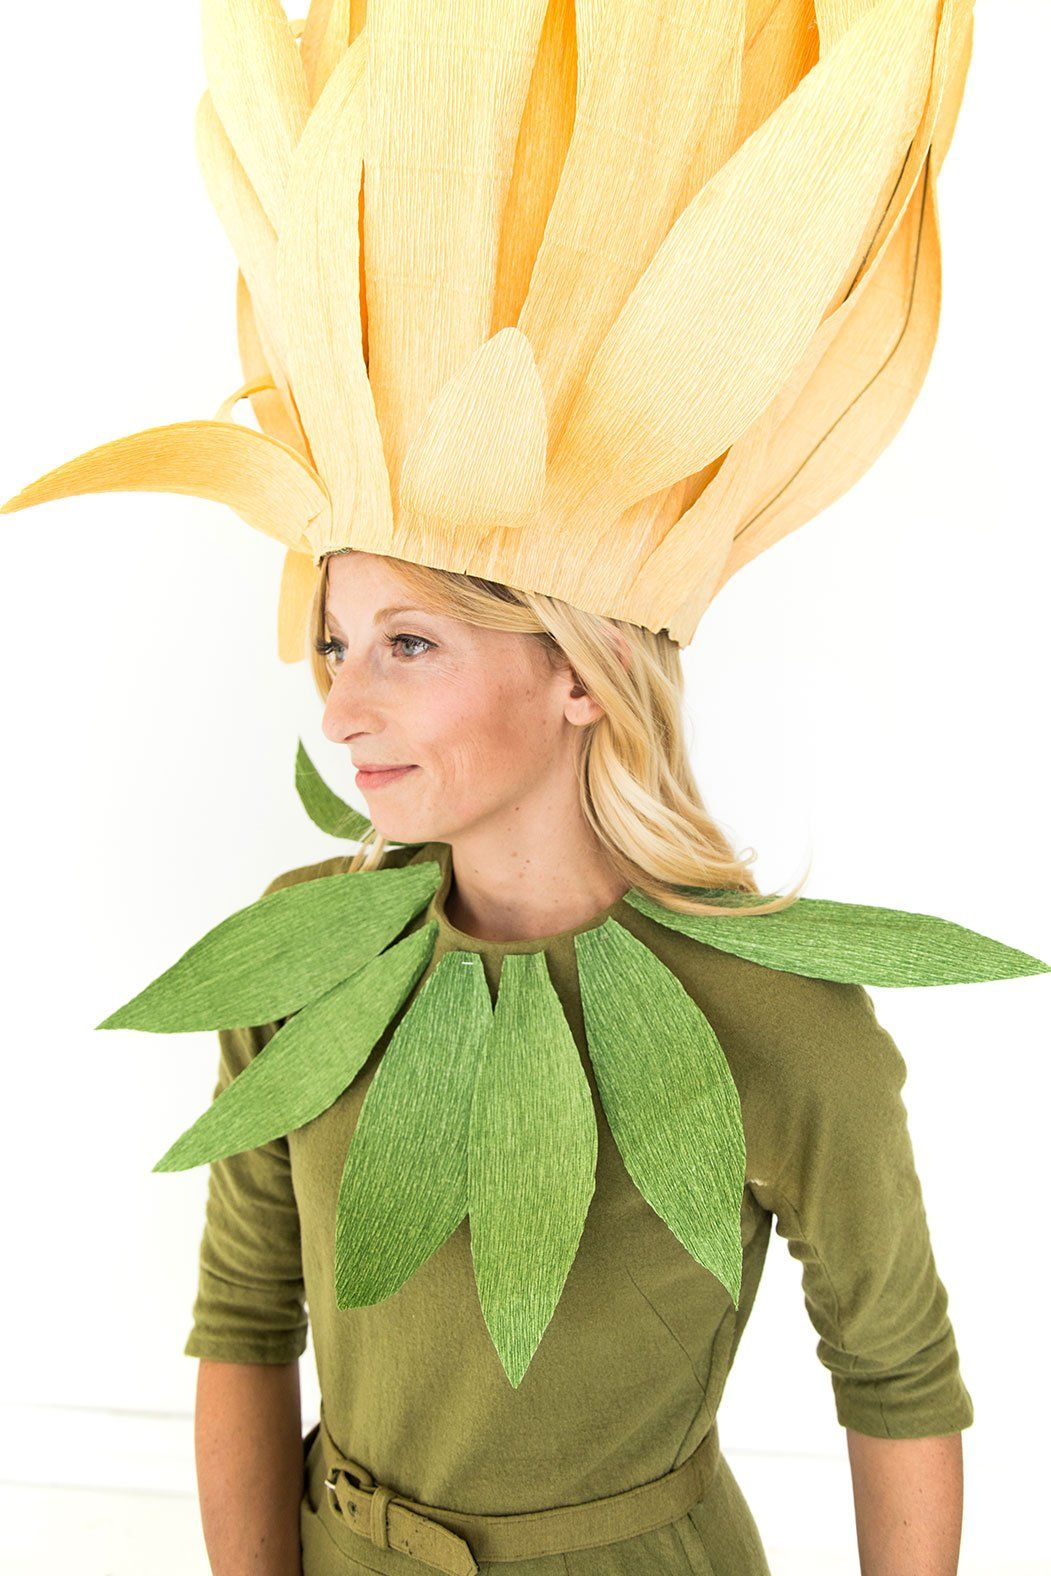 Chrysanthemum mom and daughter costume | COSTUME PARTIES ...